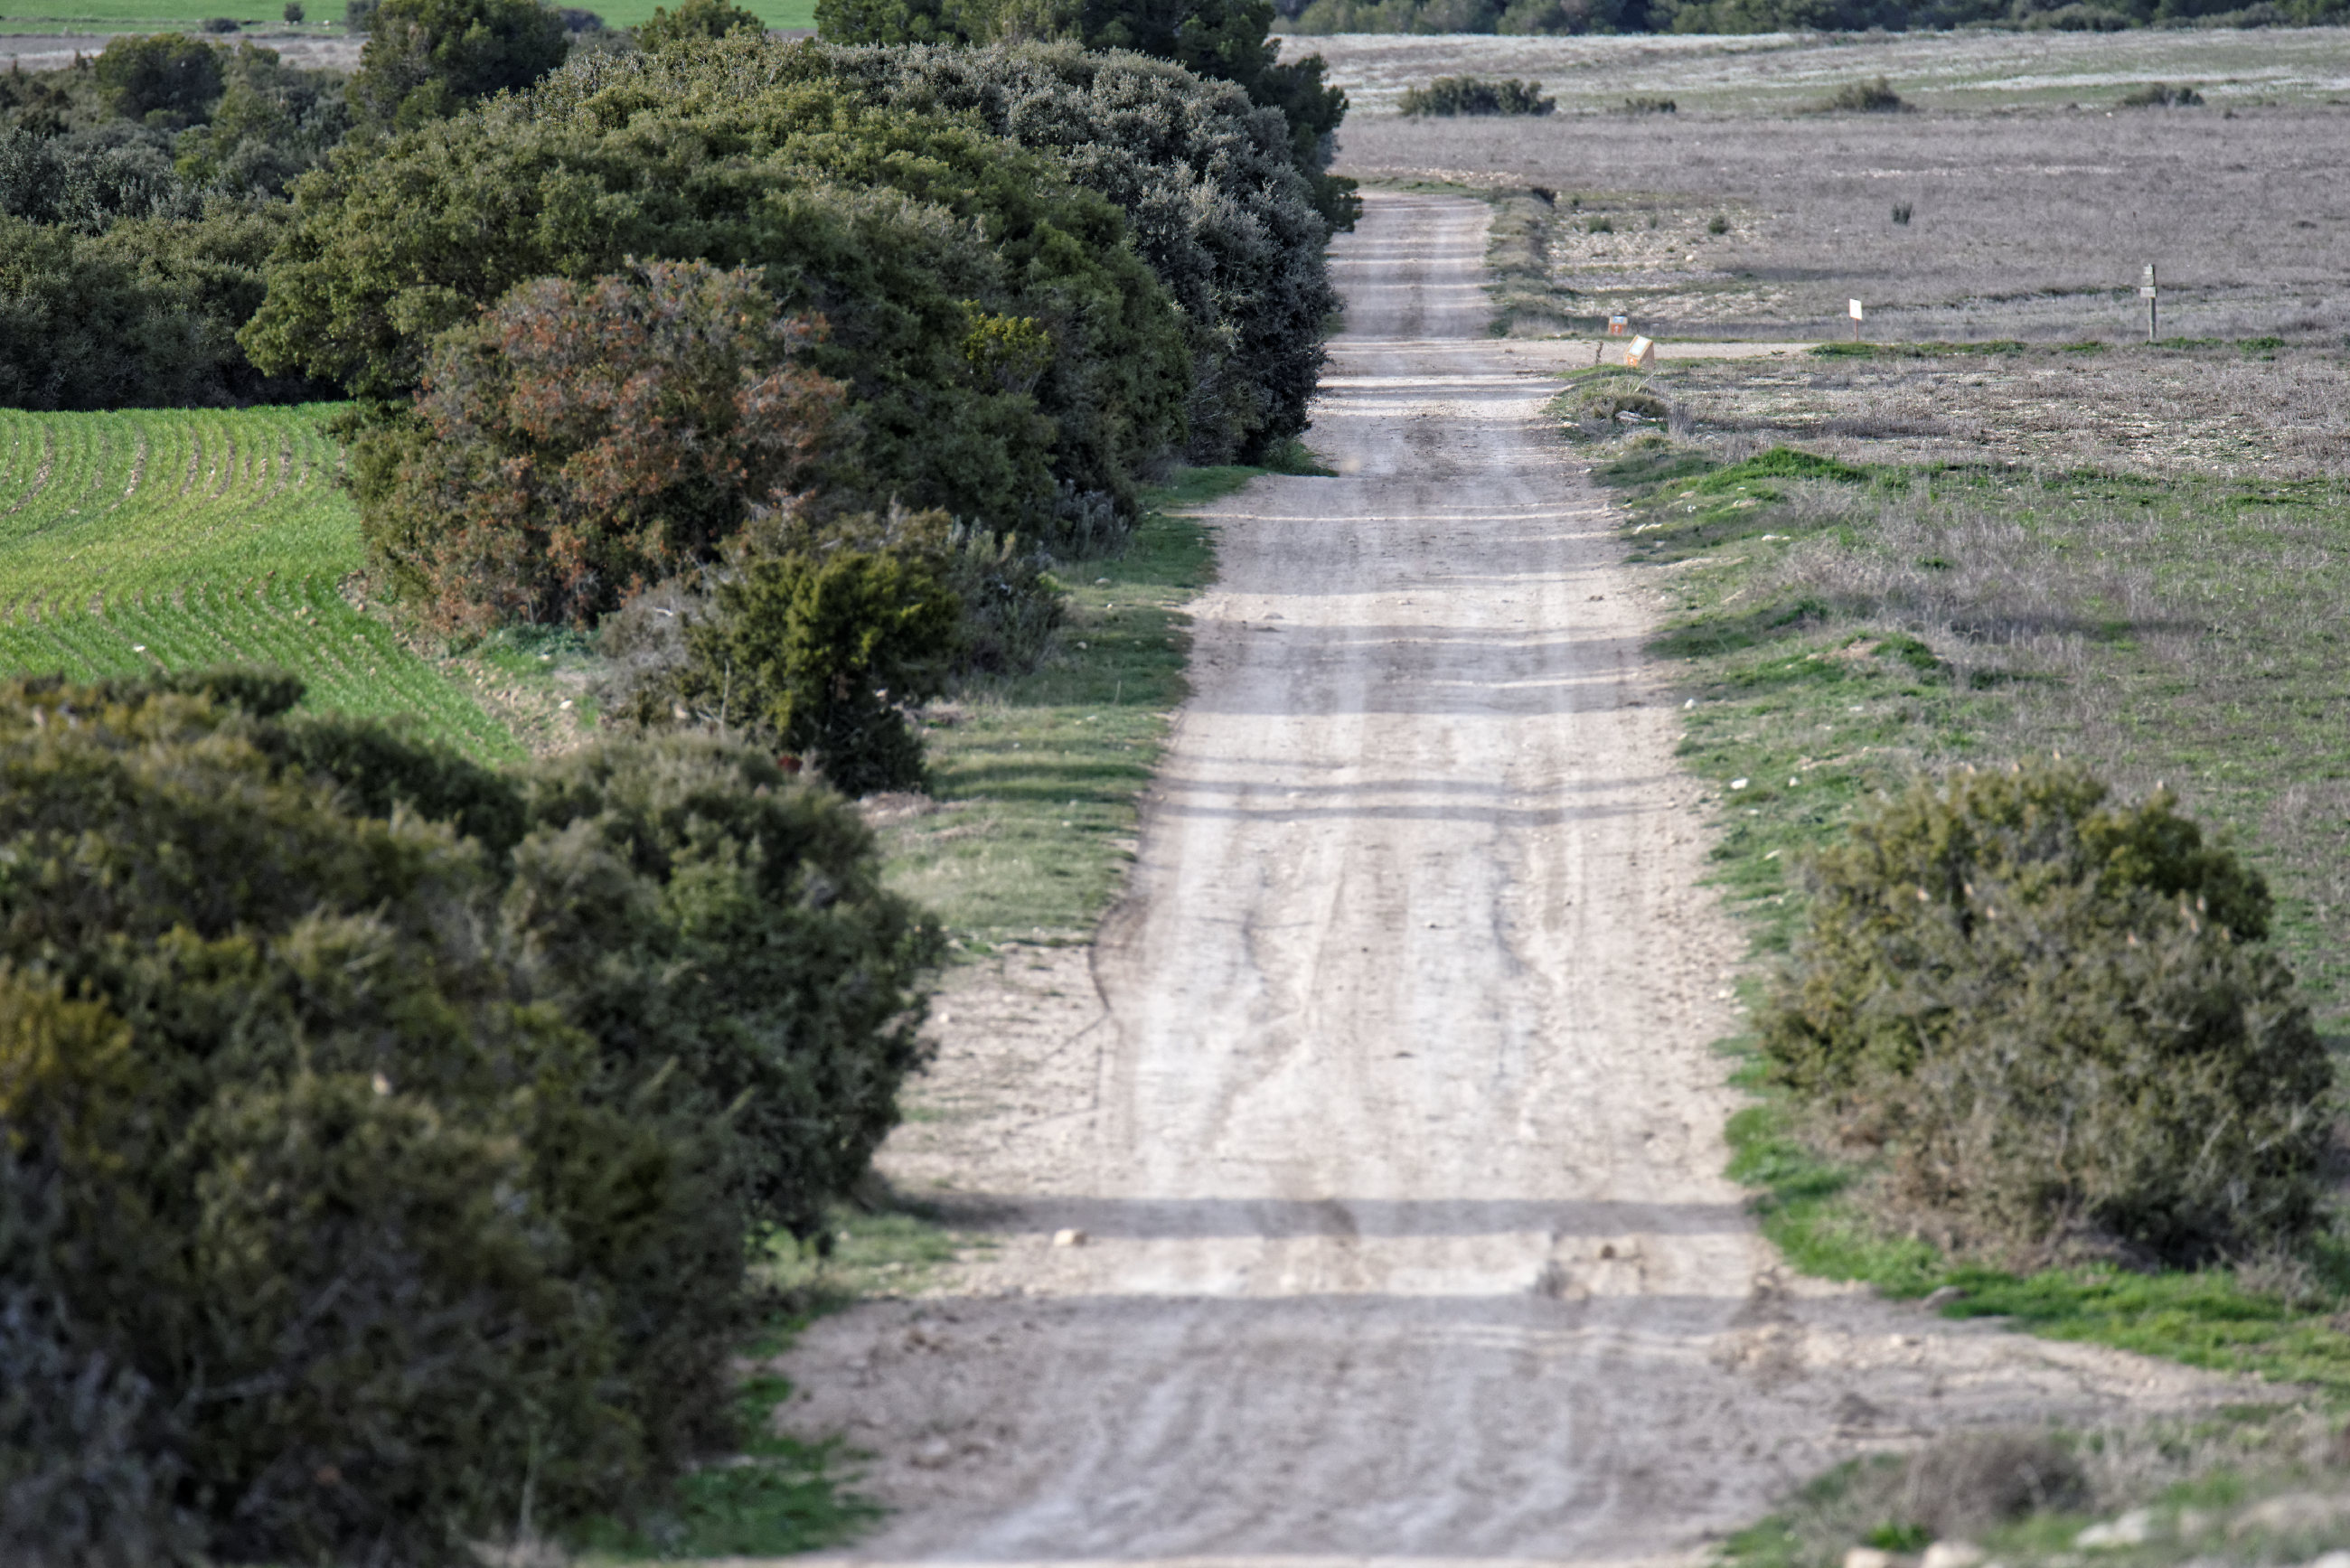 150309-Piste Sanctuaire Sanco Abarca-NA125 (Bardenas La negra) (46)